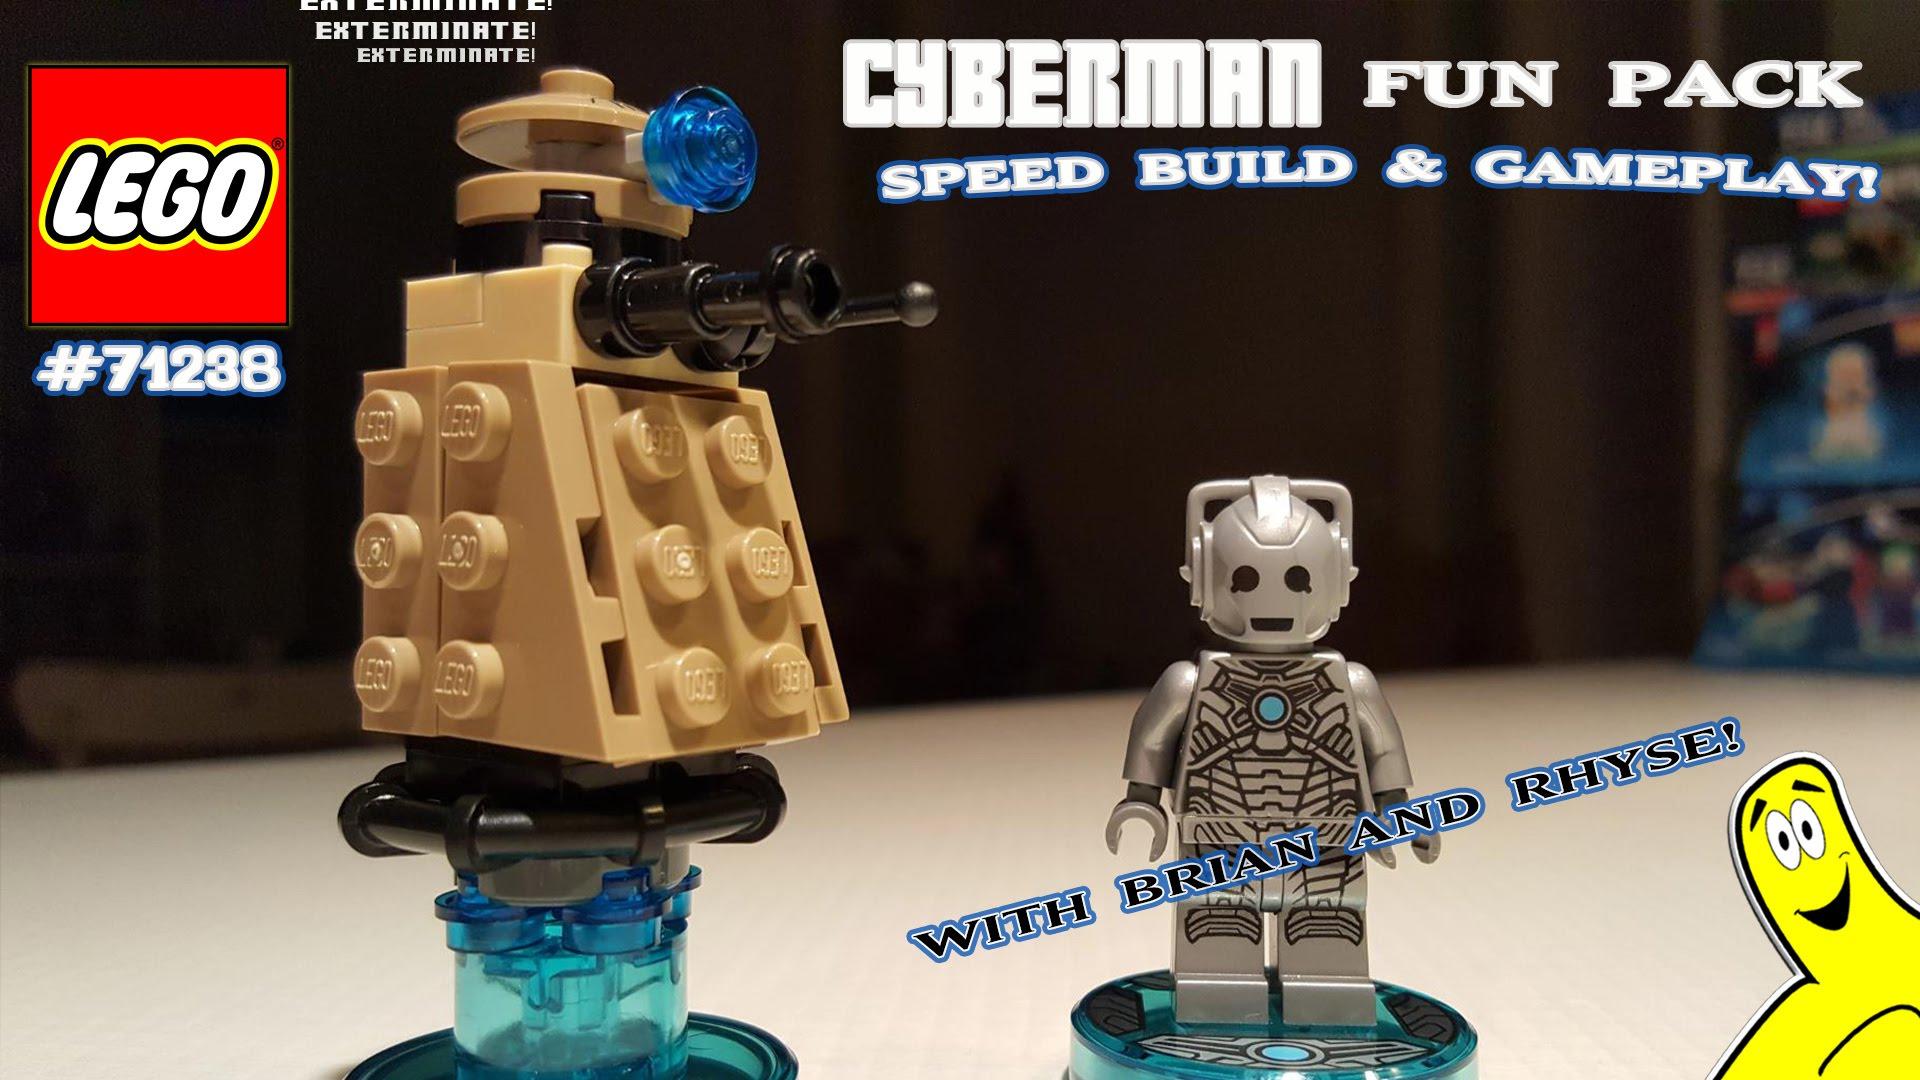 Lego Dimensions: #71238 Cyberman Unboxing/SpeedBuild/Gameplay – HTG